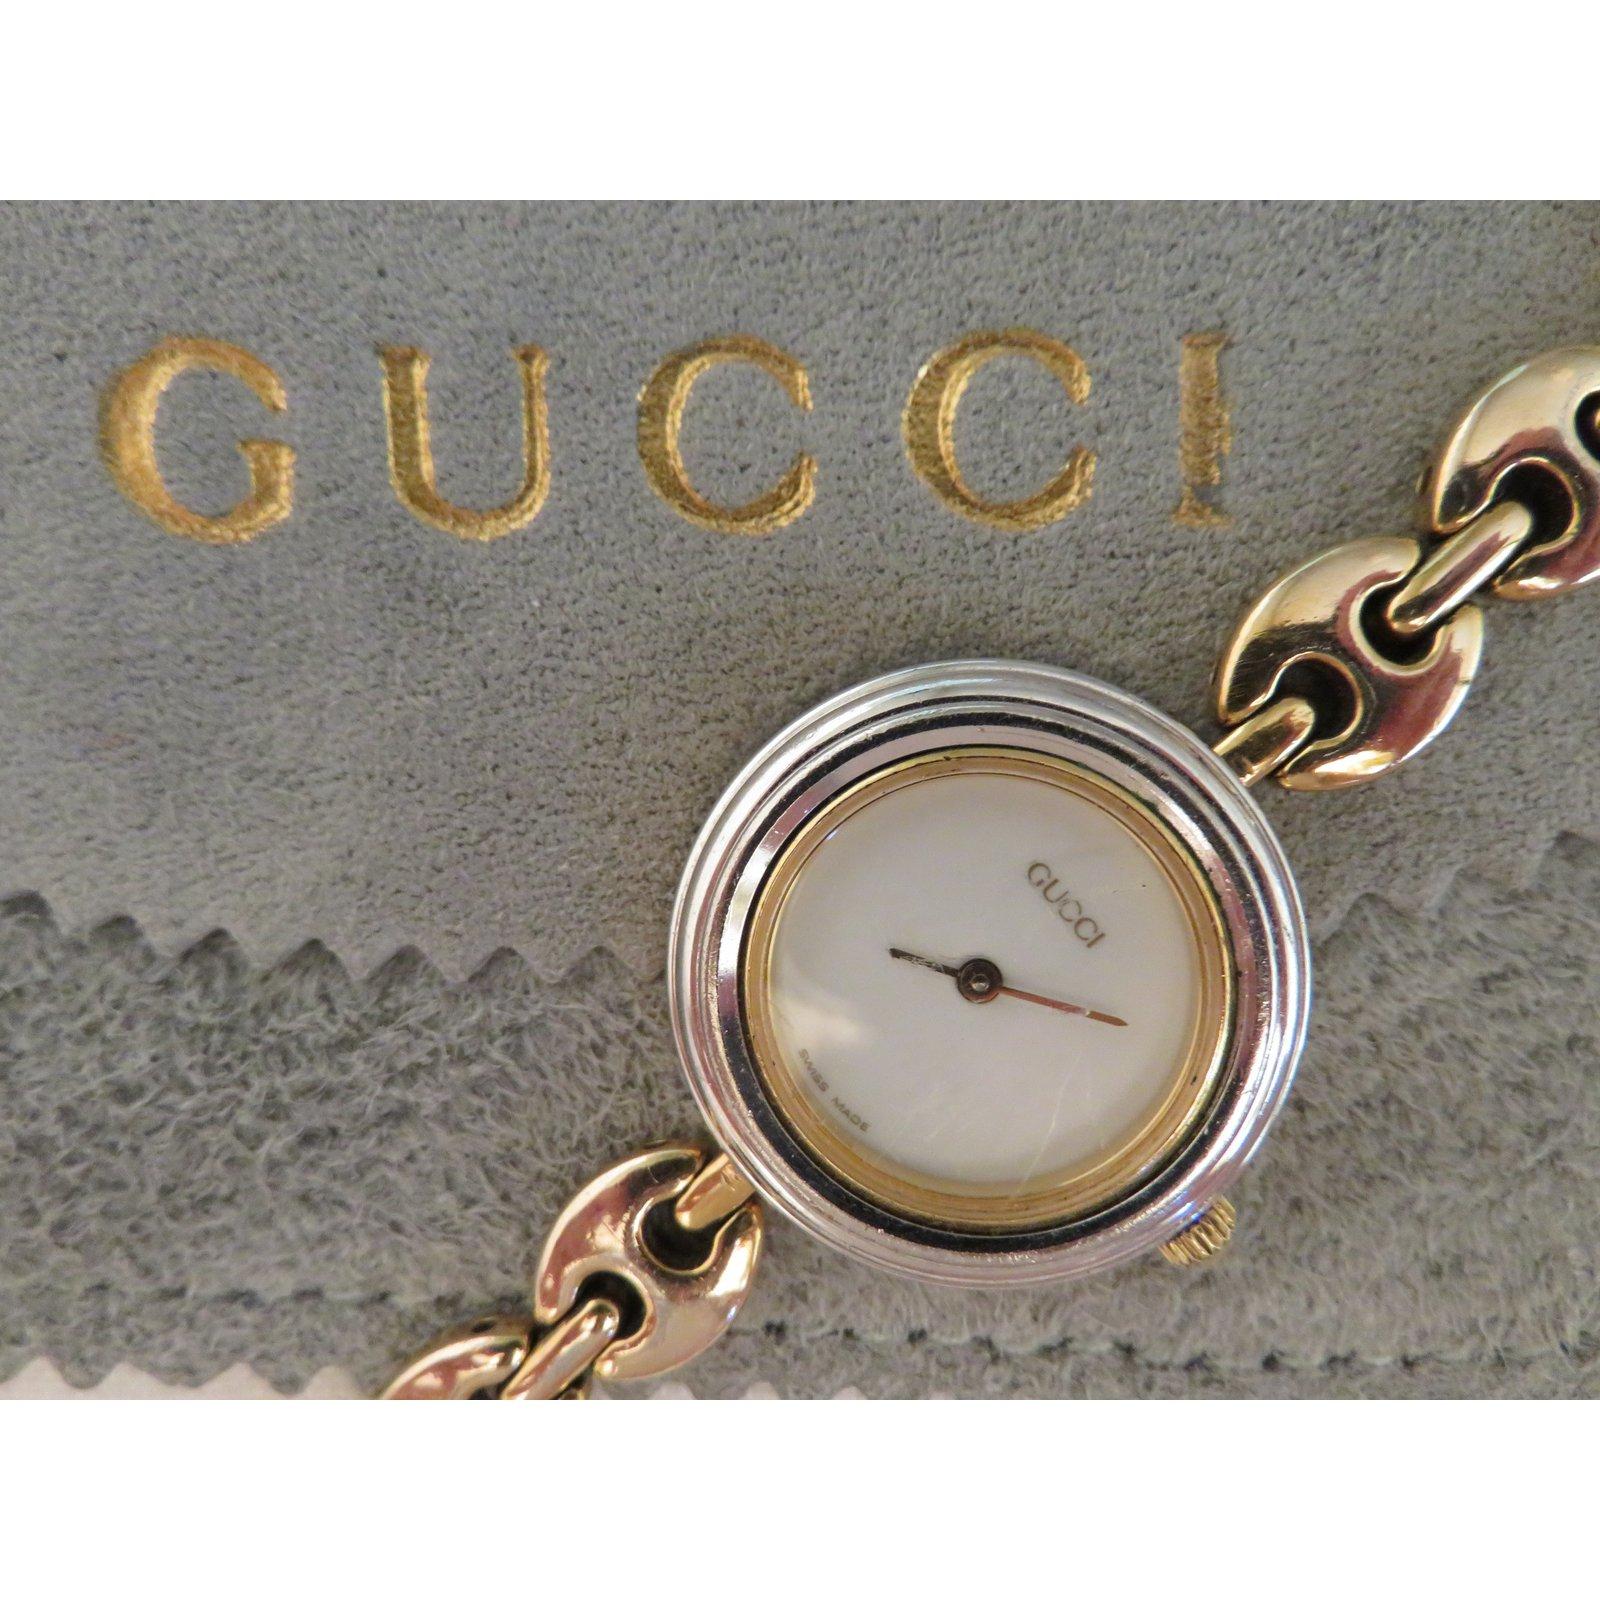 1bb113f21732 Gucci Fine Watches Gold Plated Golden Ref 21997 Joli